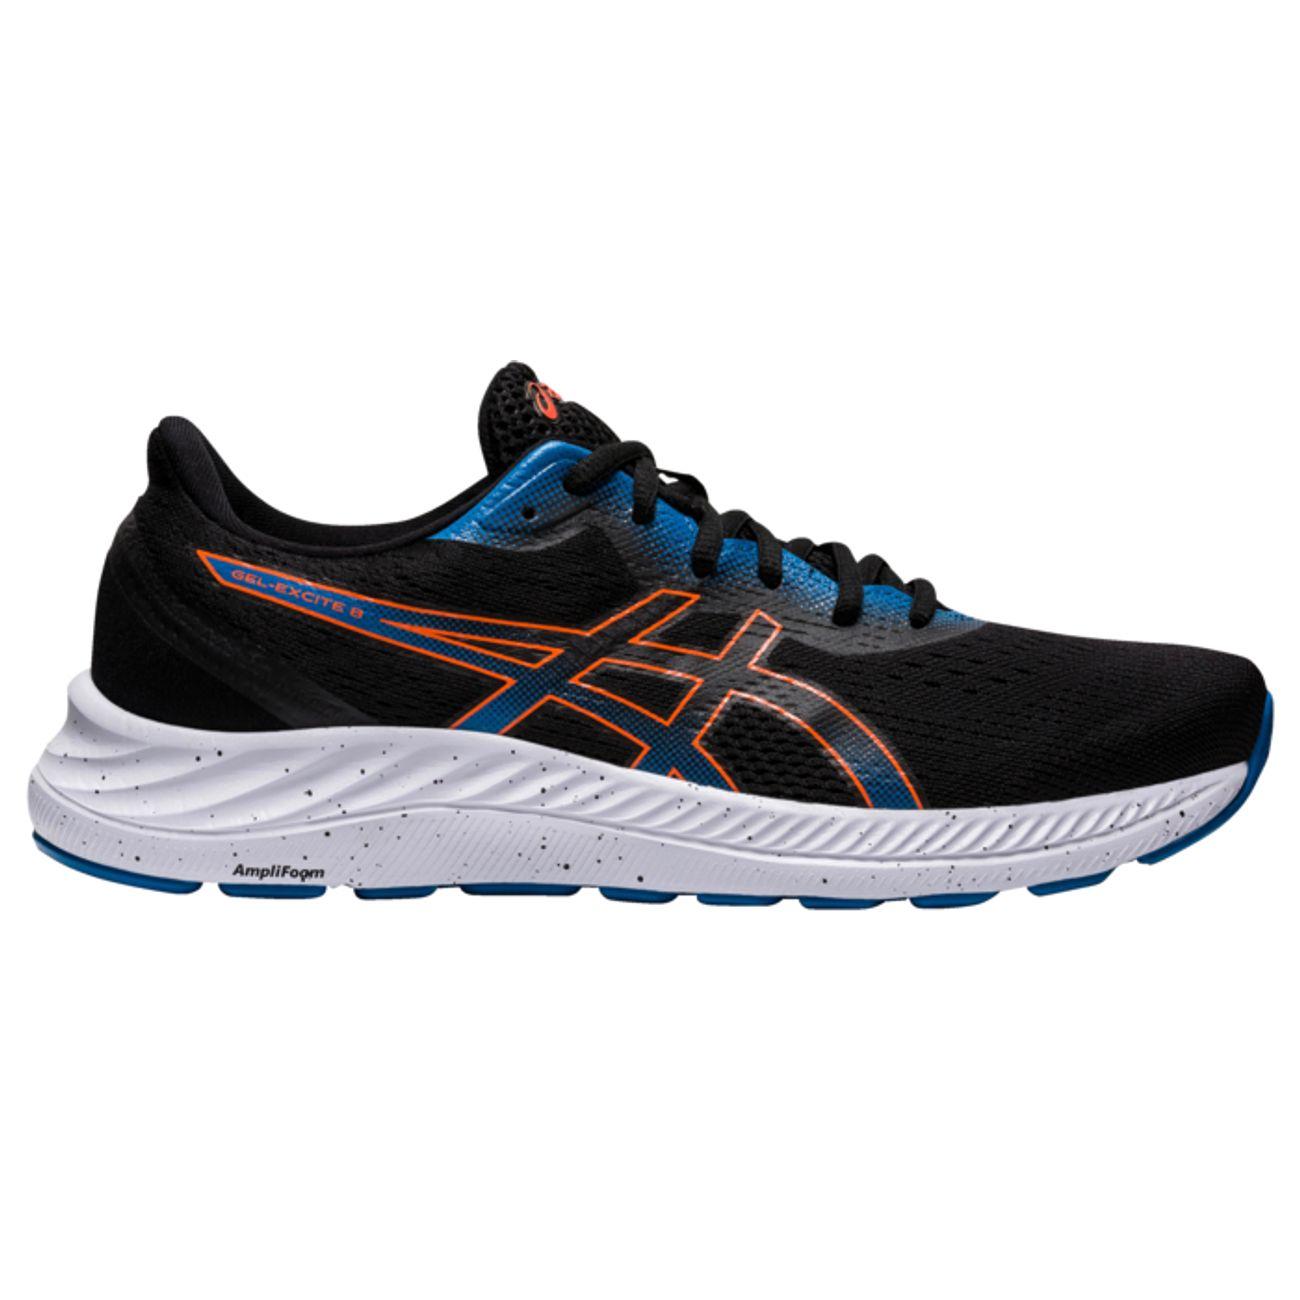 CHAUSSURES DE RUNNING running homme ASICS GEL-EXCITE 8 M